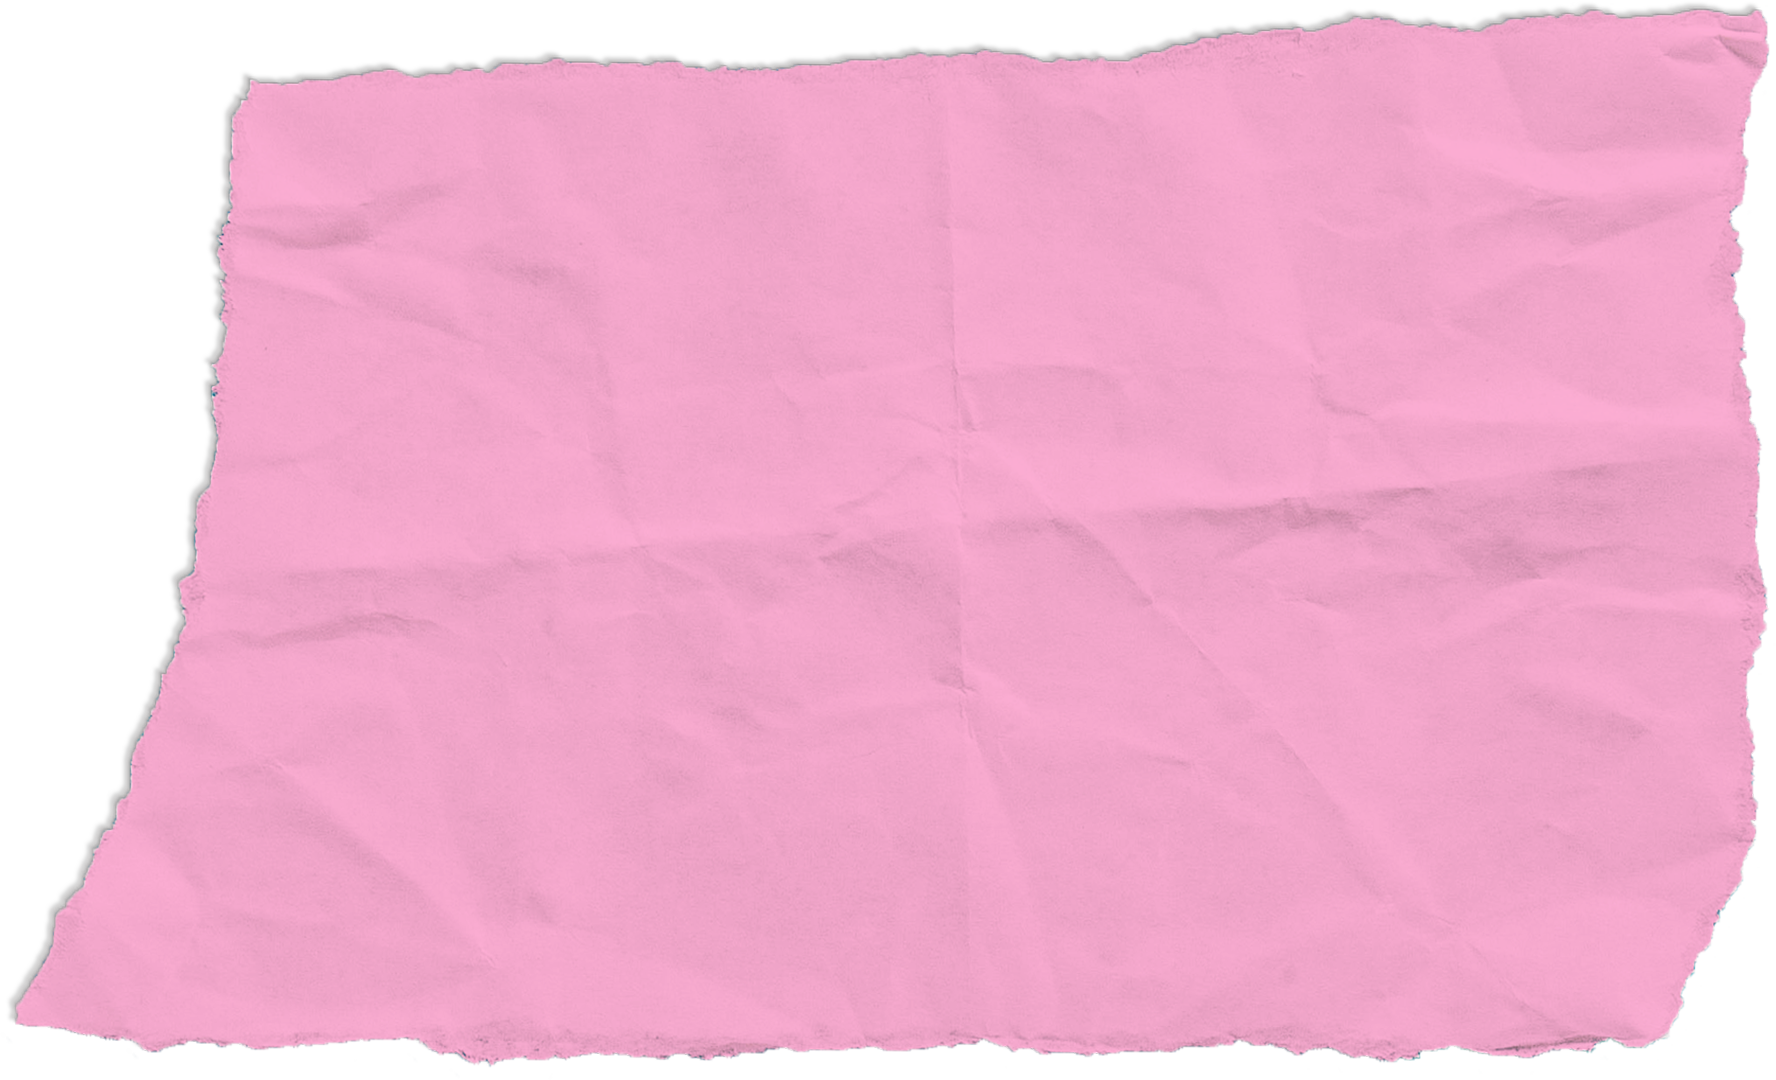 pinkpaper.png